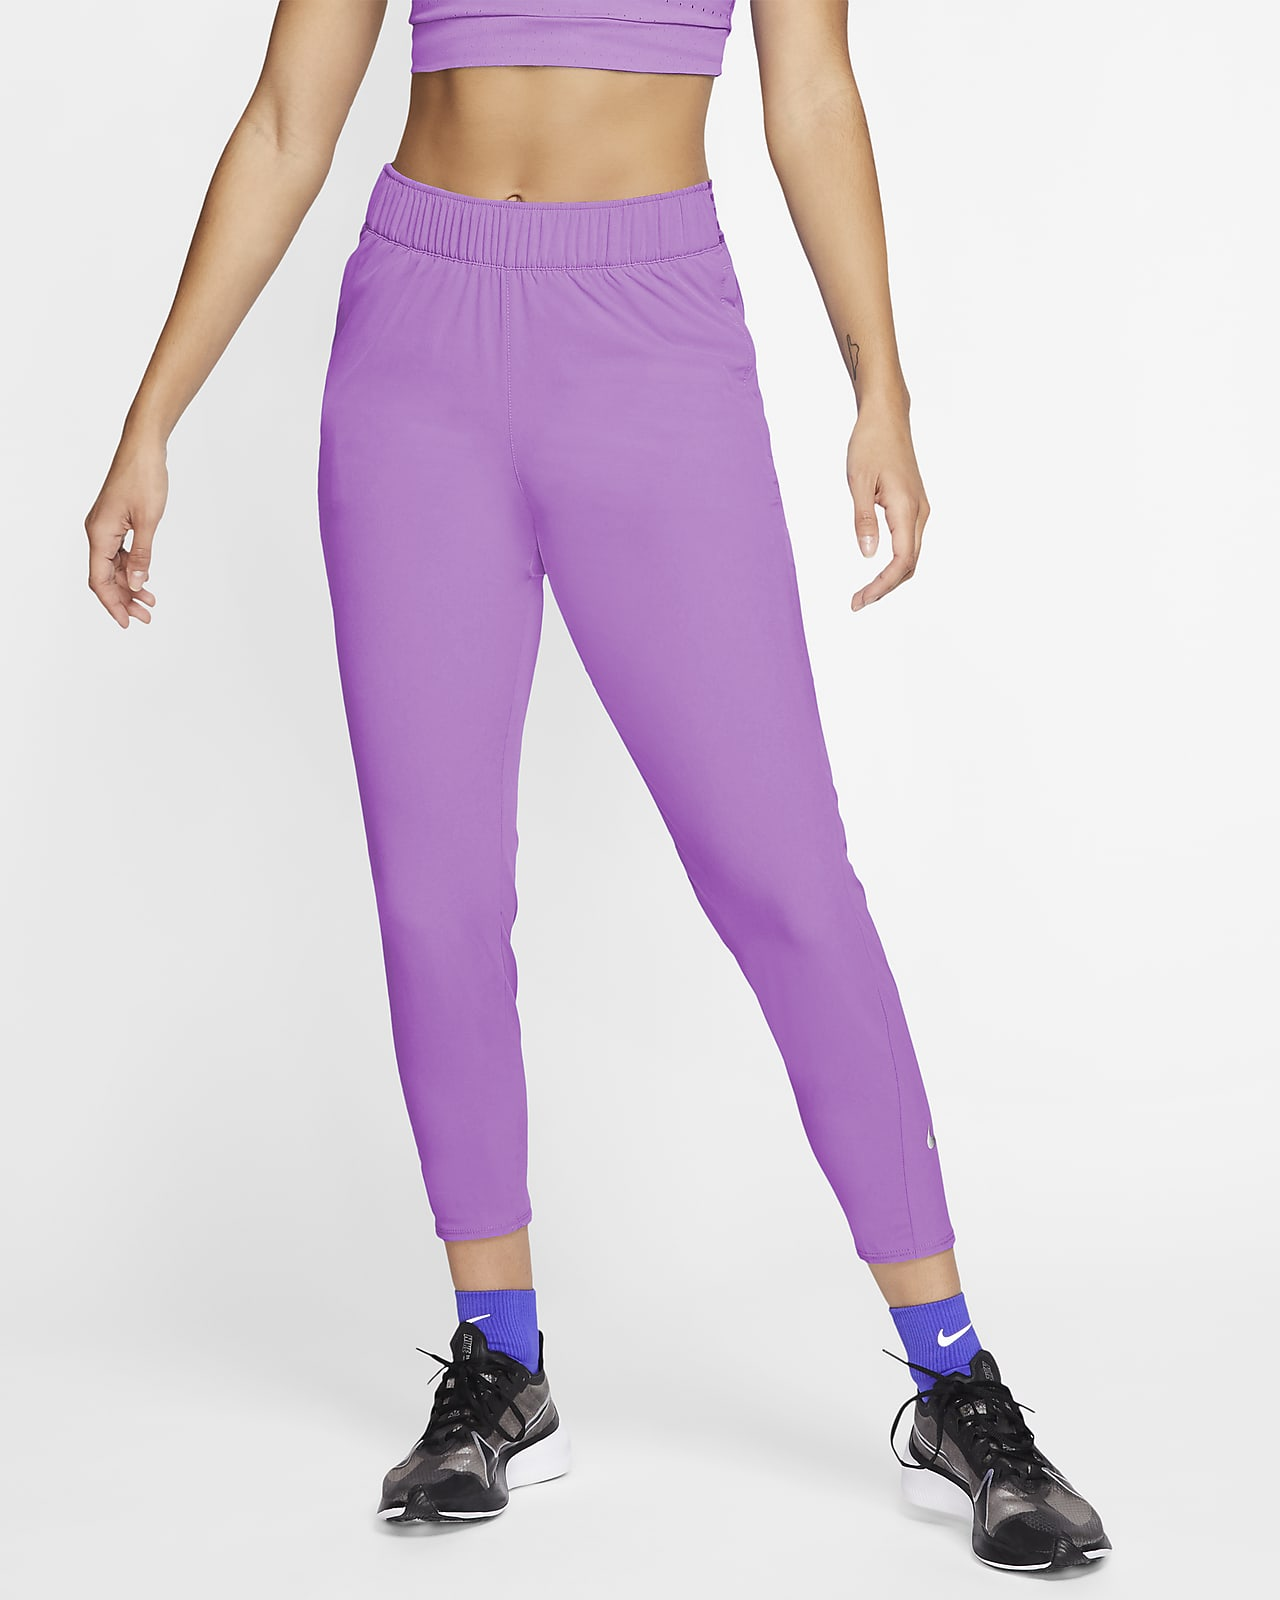 Dámské 7/8 běžecké kalhoty Nike Essential